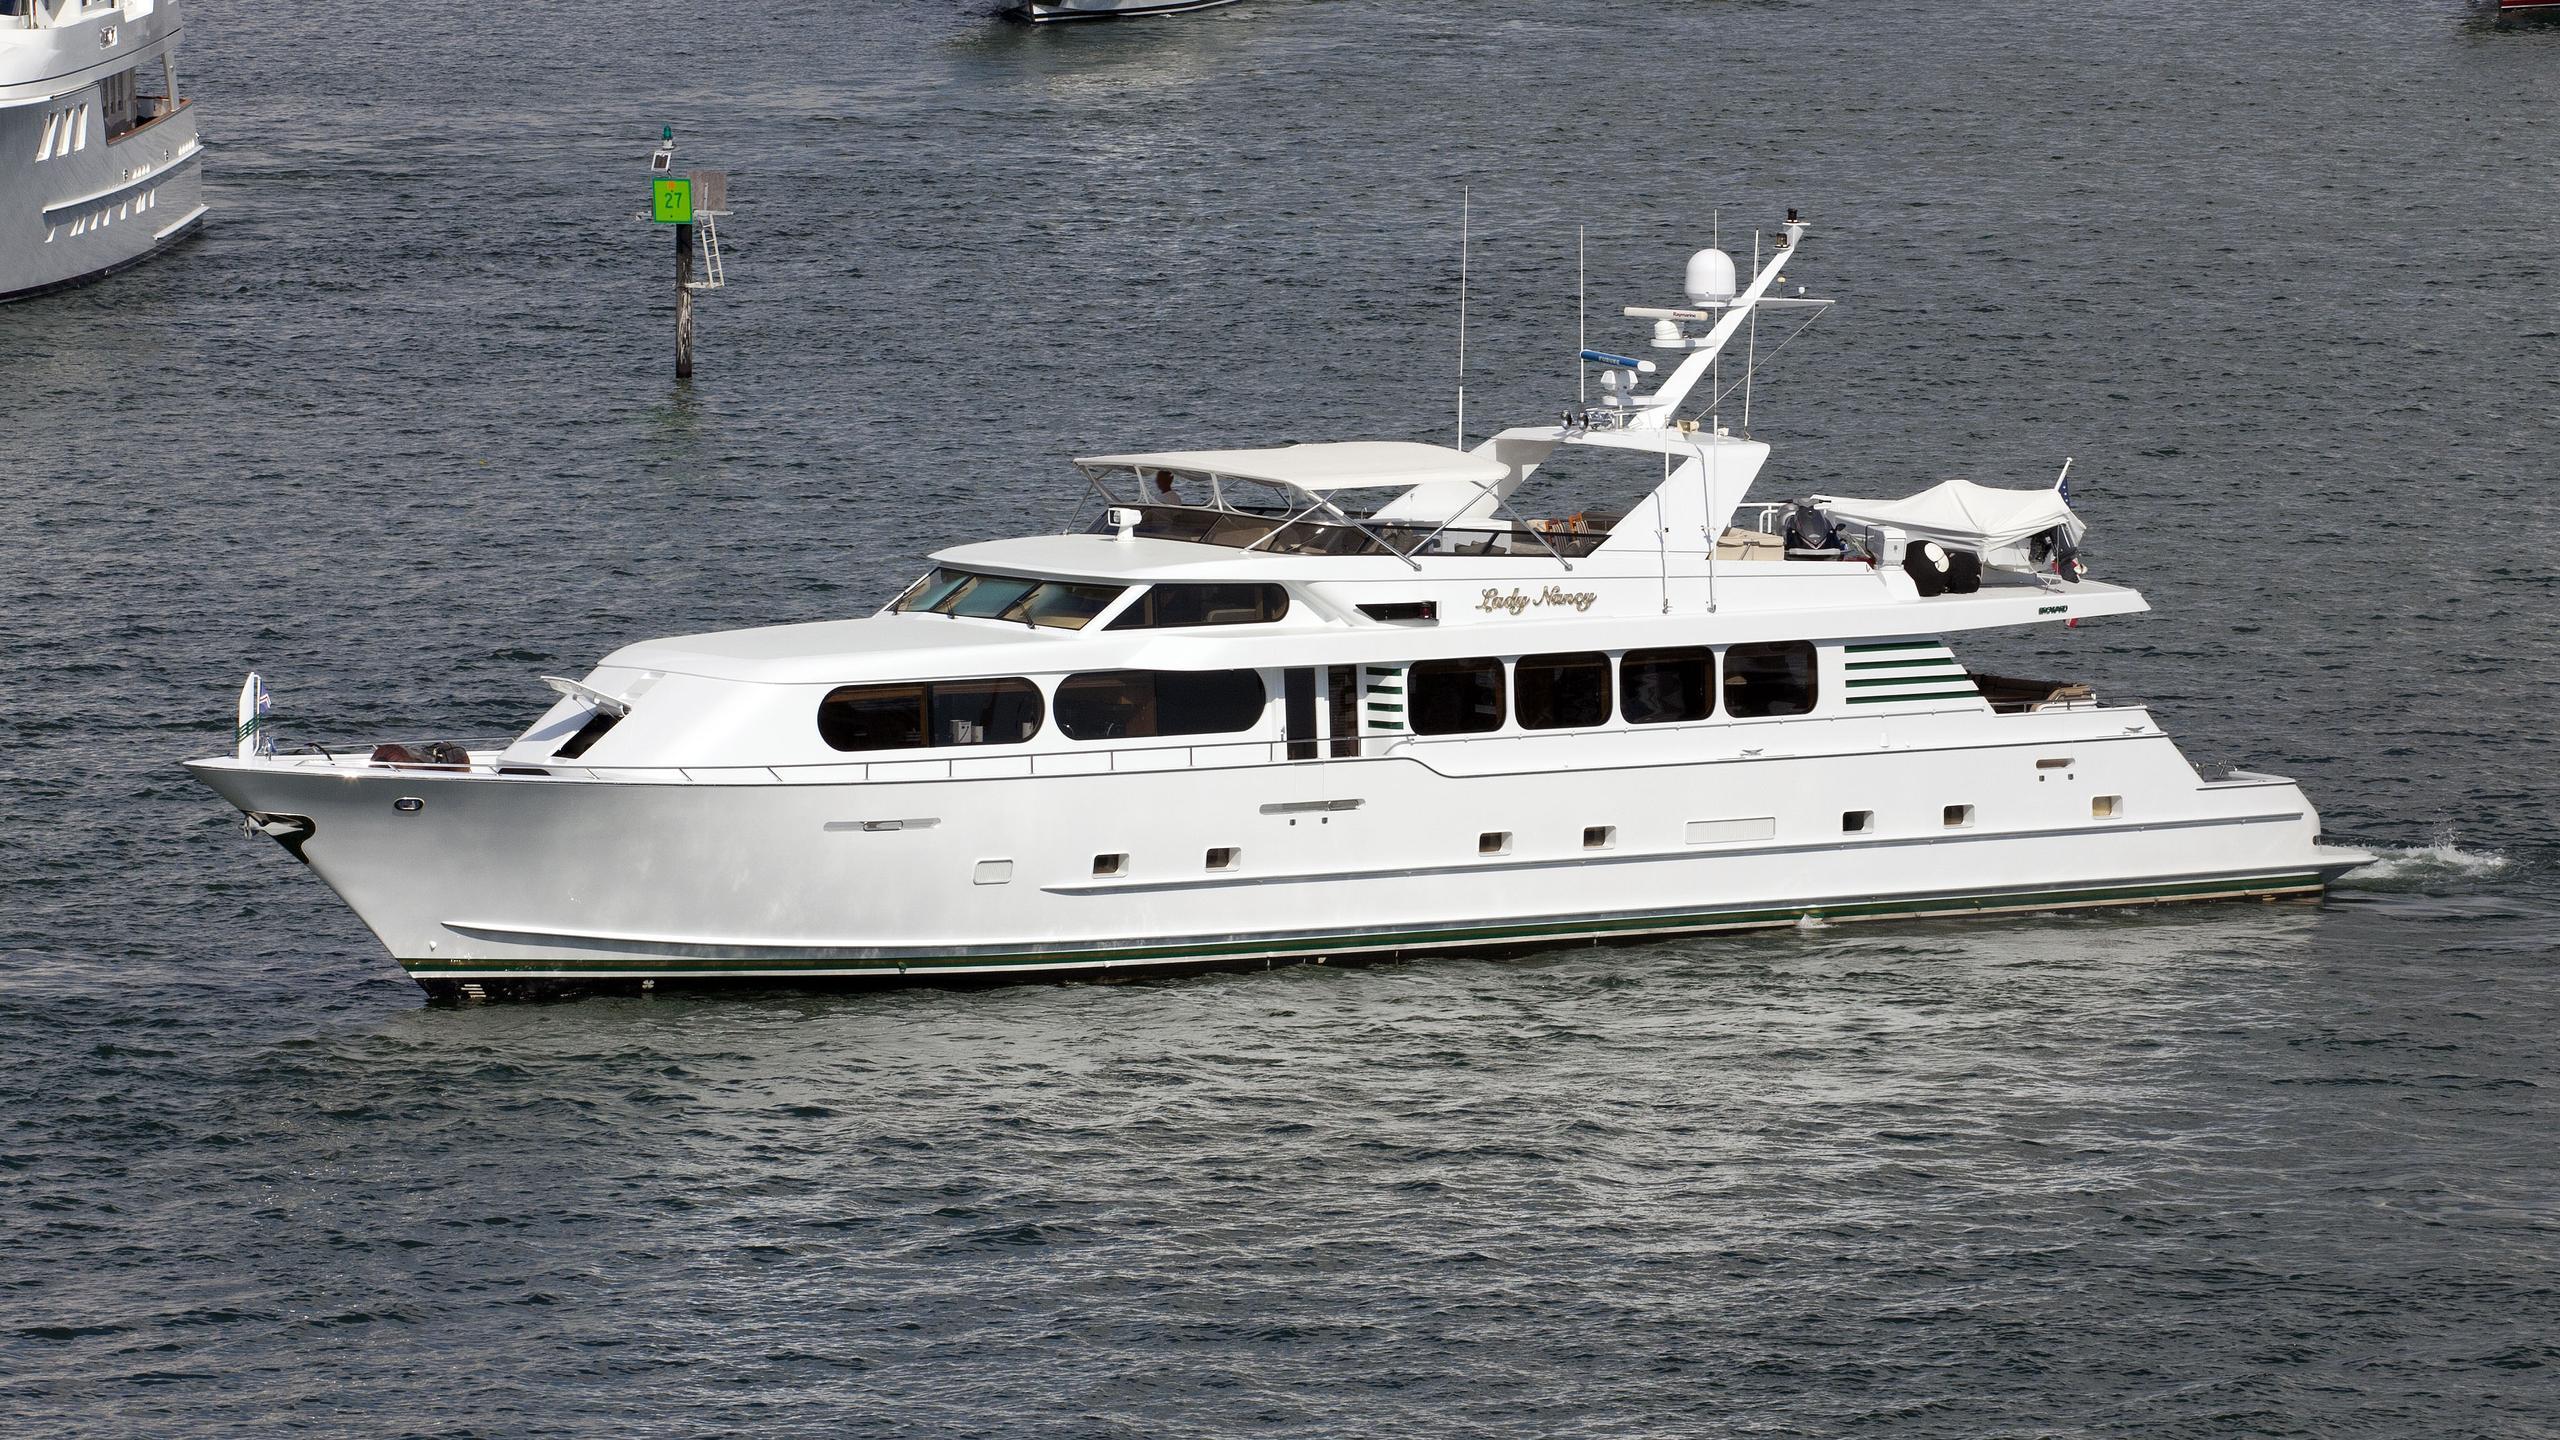 carla-elena-ii-motor-yacht-broward-2003-34m-profile